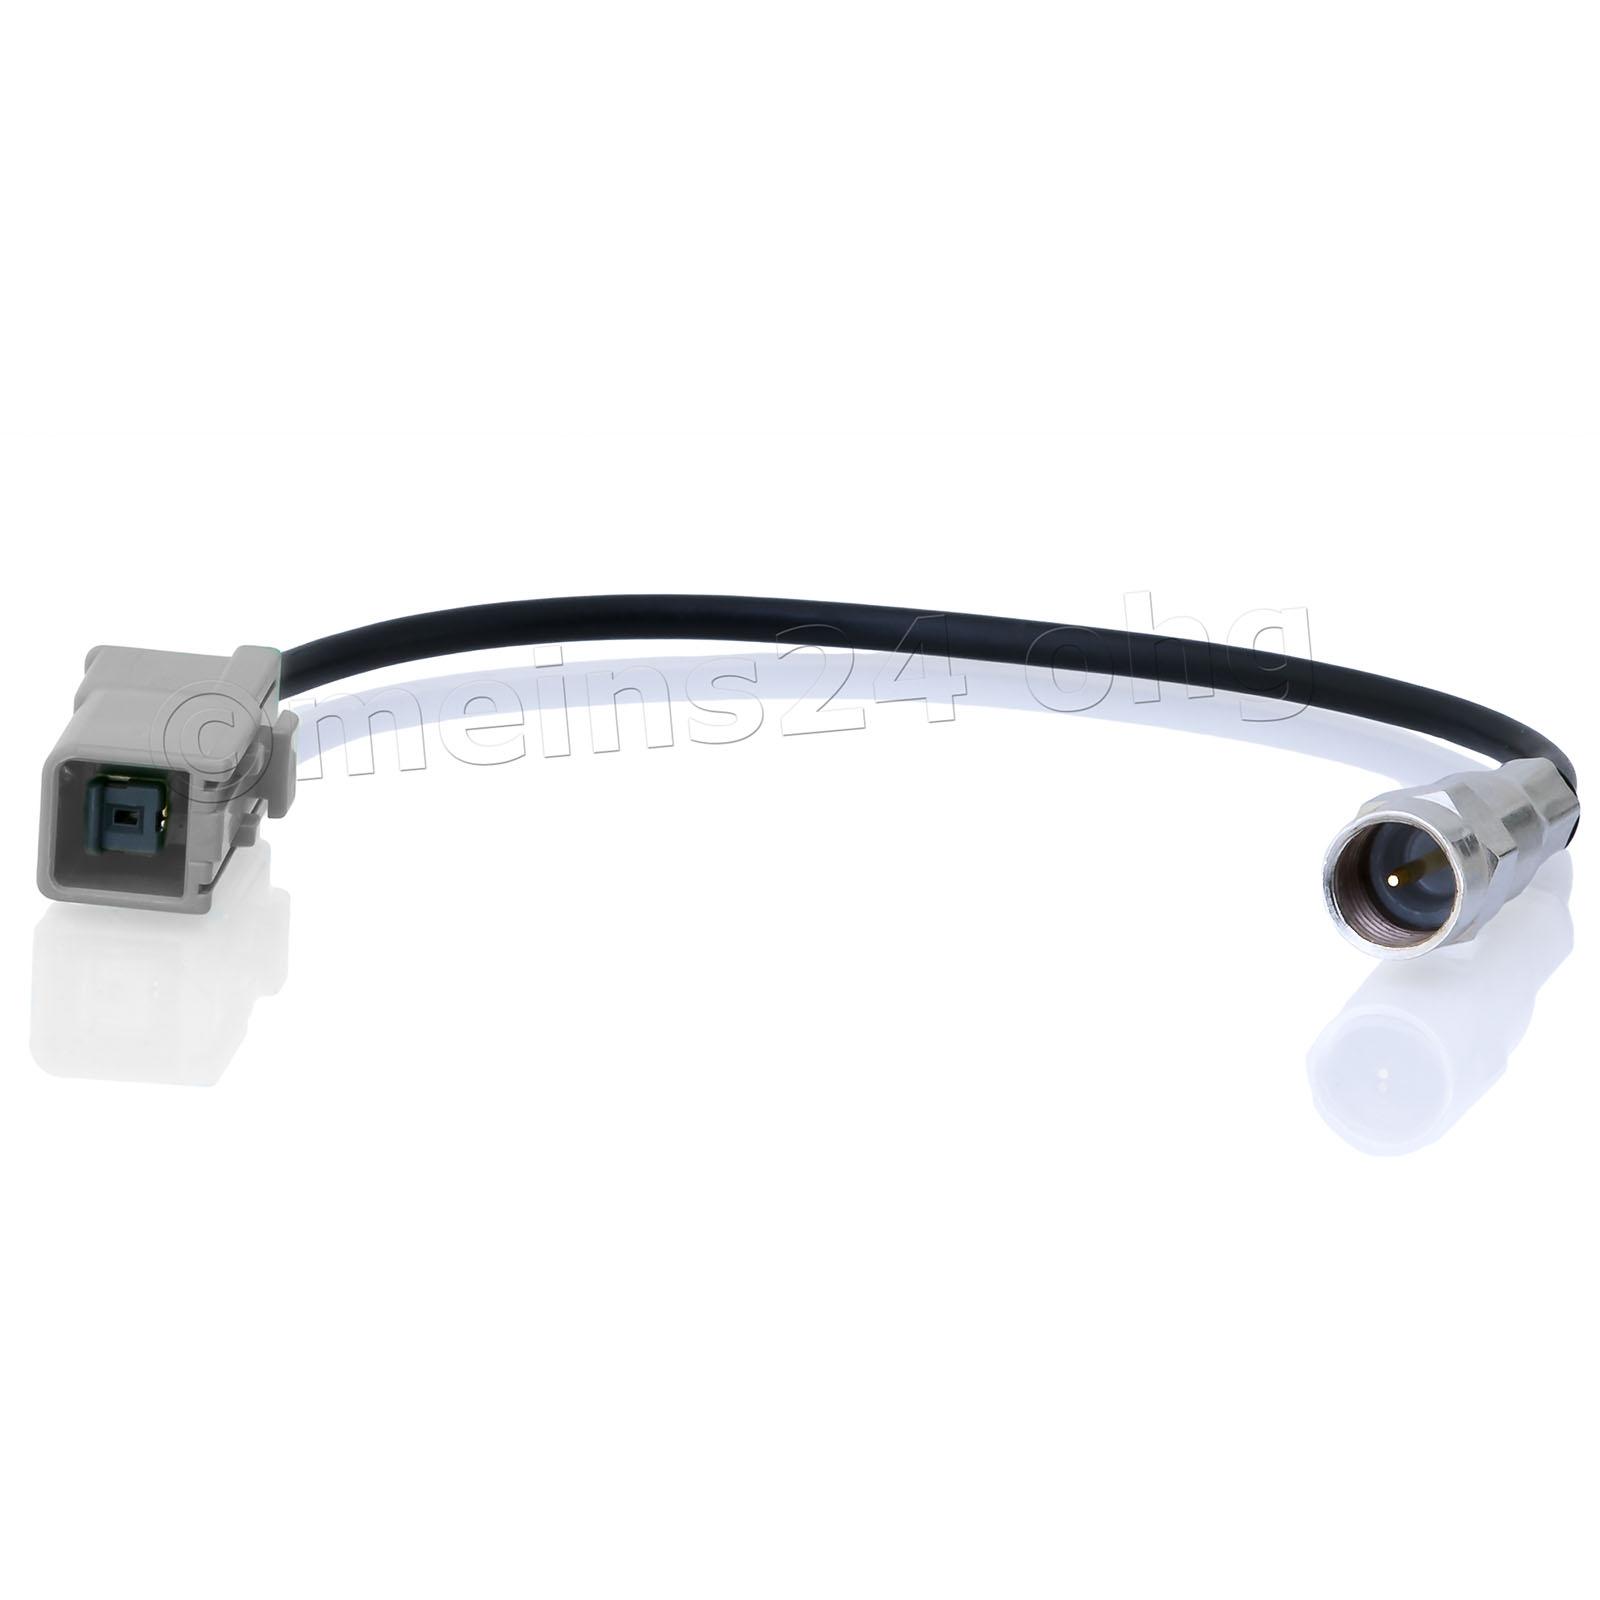 Antennenadapter GT5 1S 1PP Buchse (f) -> FME Stecker (m)